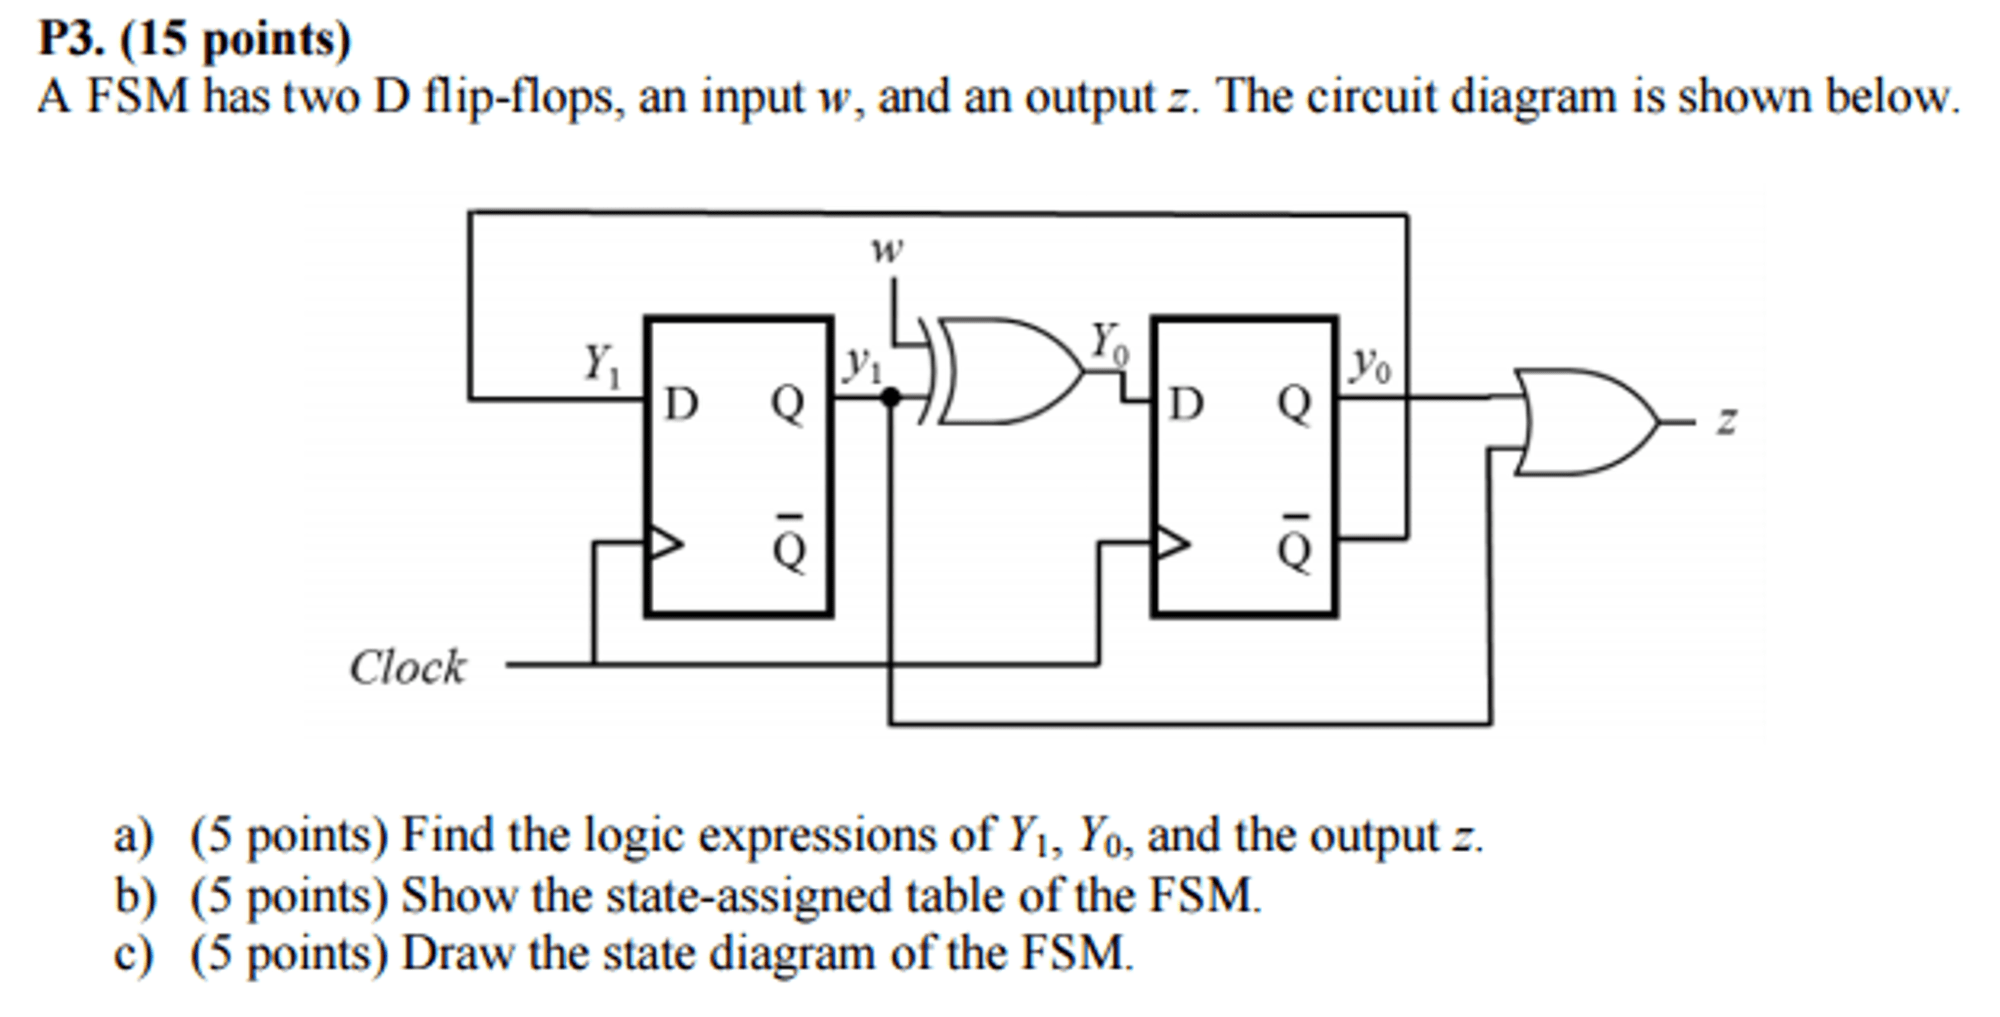 hight resolution of a fsm has two d flip flops an input w and an out